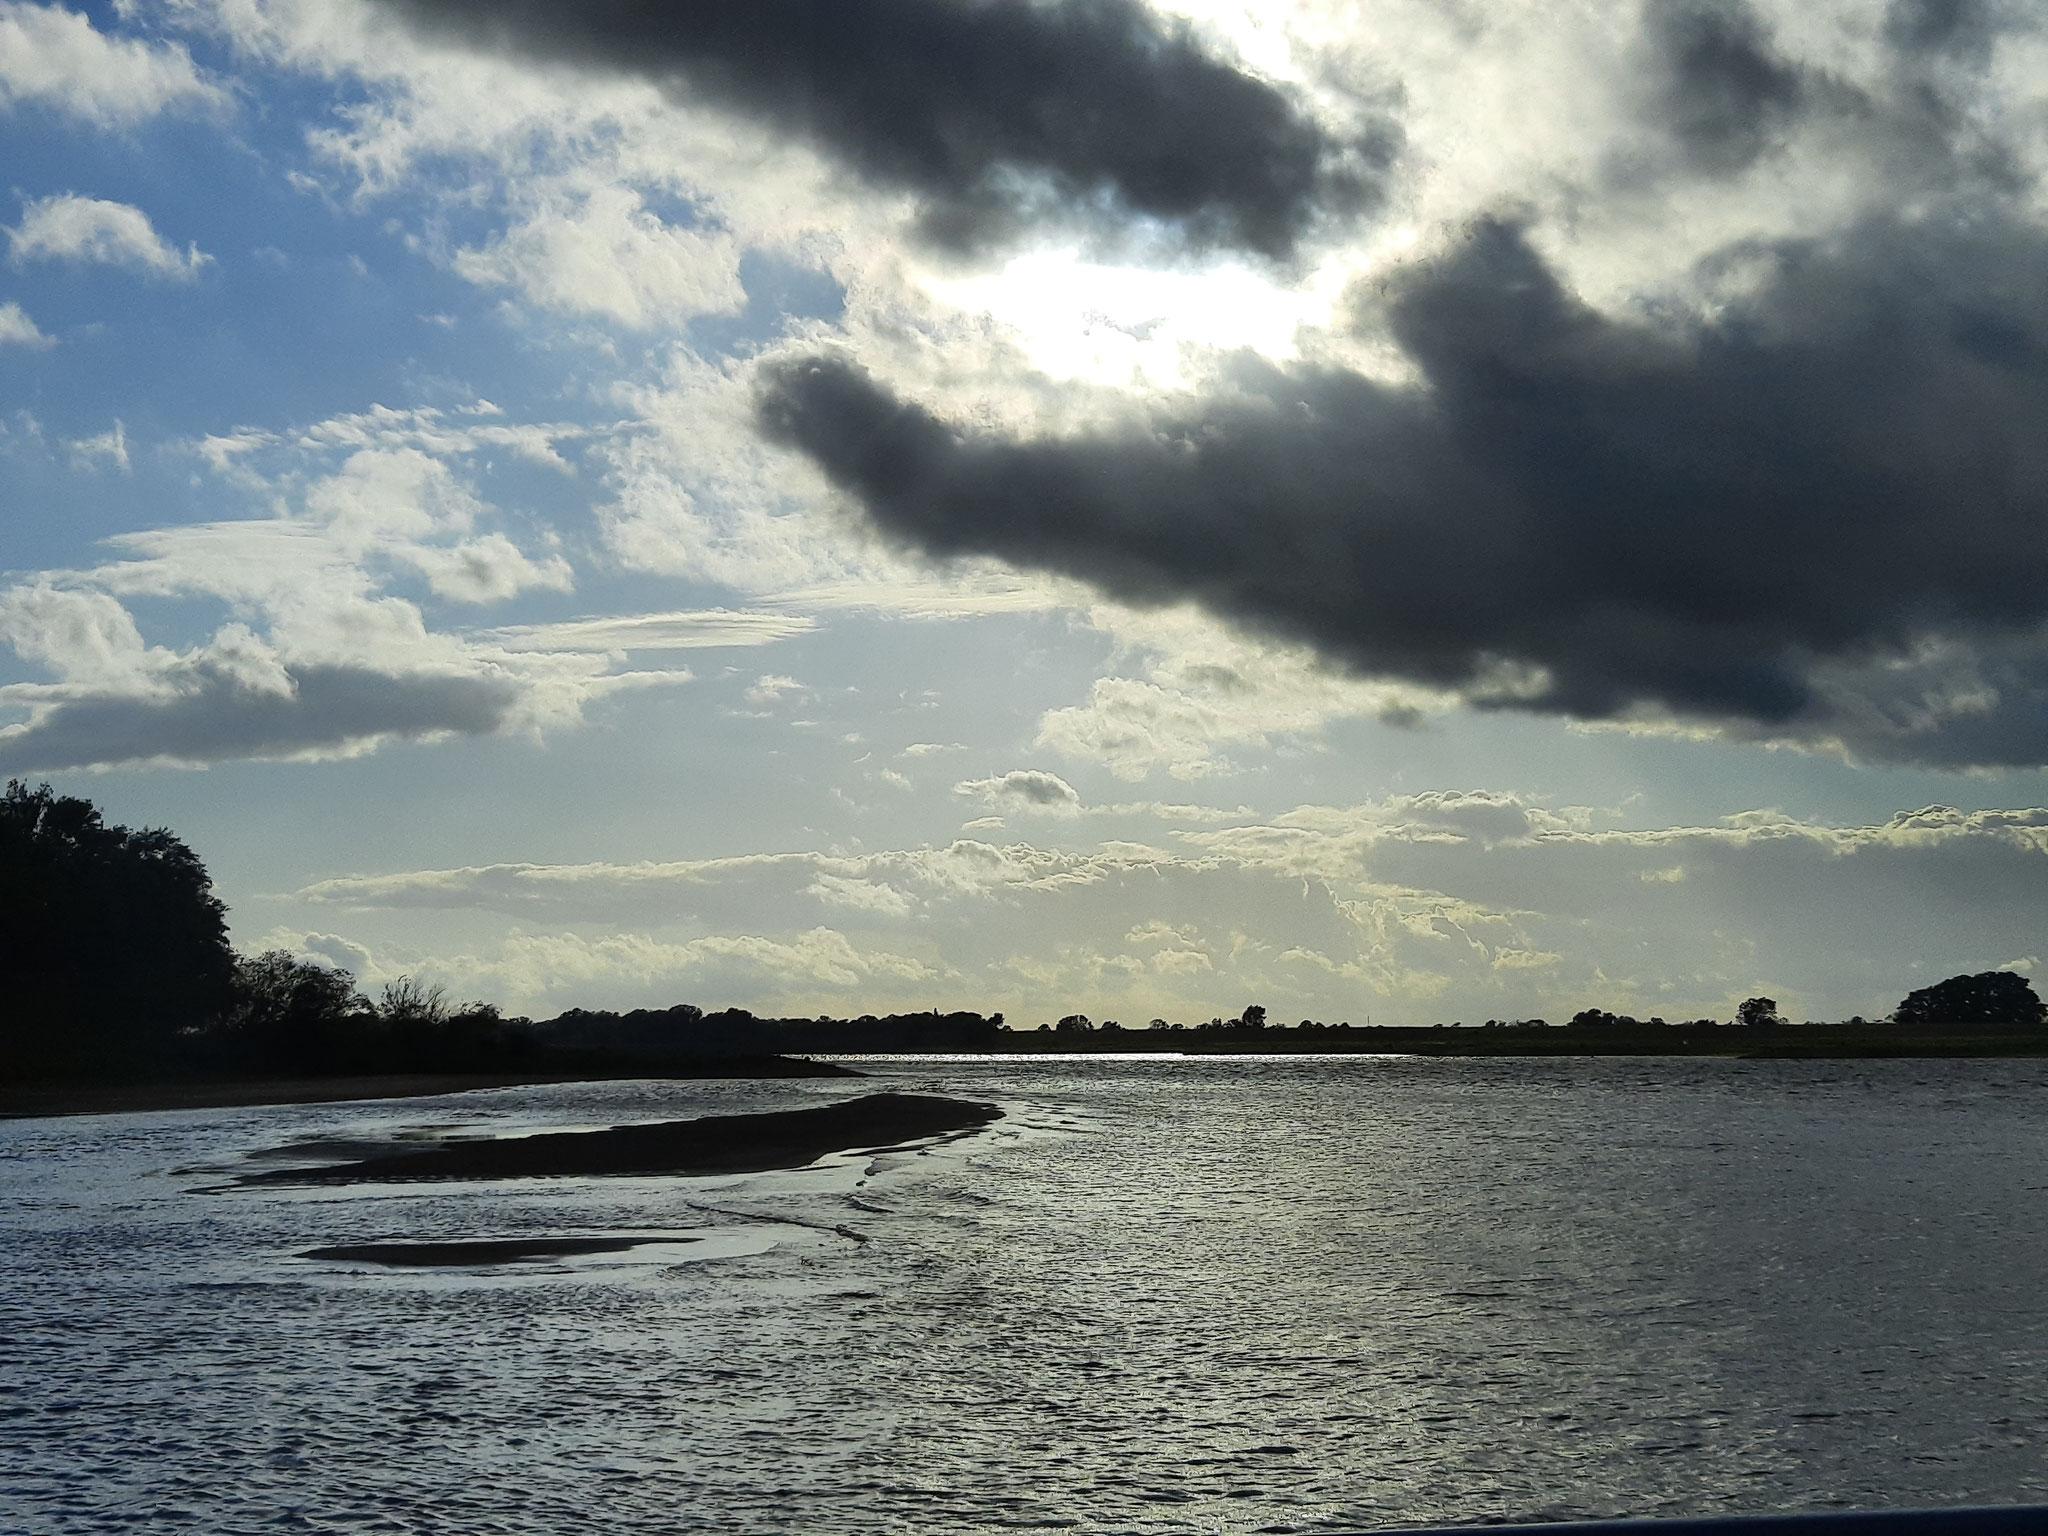 An der Elbe. Foto: J. de Gruyter